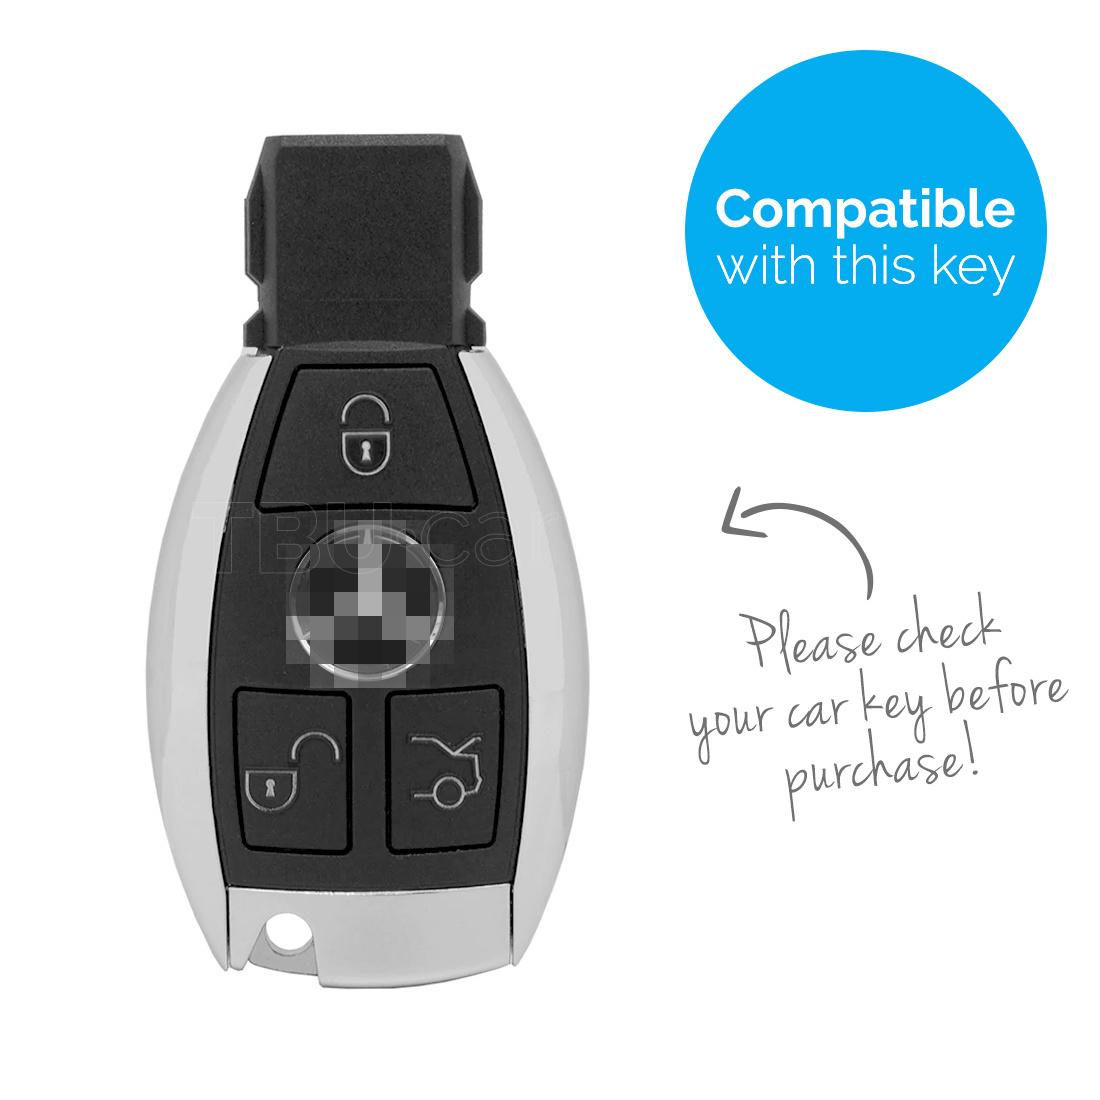 TBU car TBU car Sleutel cover compatibel met Mercedes - Silicone sleutelhoesje - beschermhoesje autosleutel - Zebra